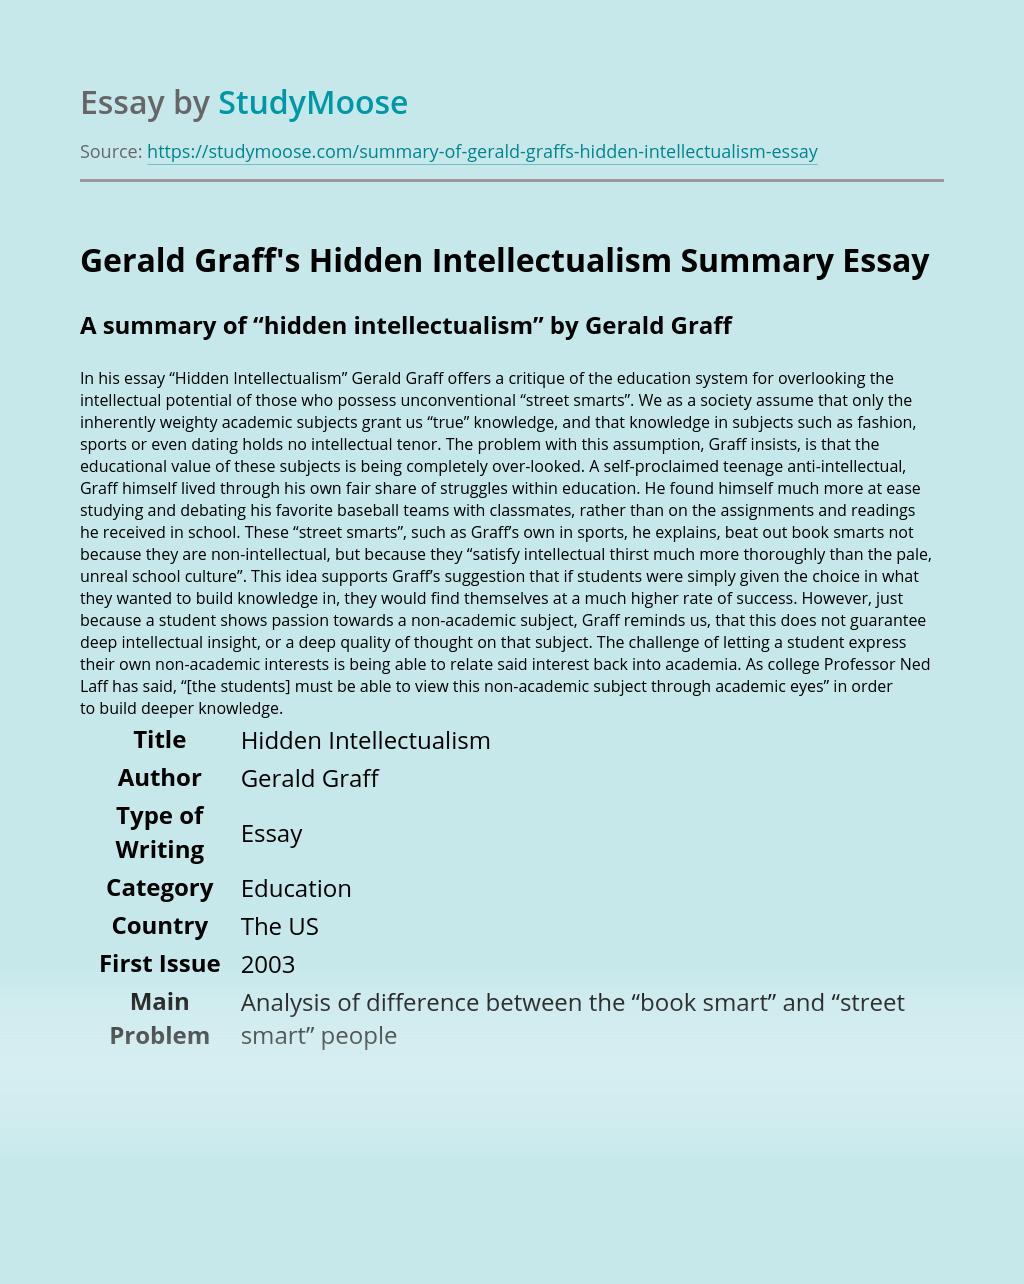 Gerald Graff's Hidden Intellectualism Summary